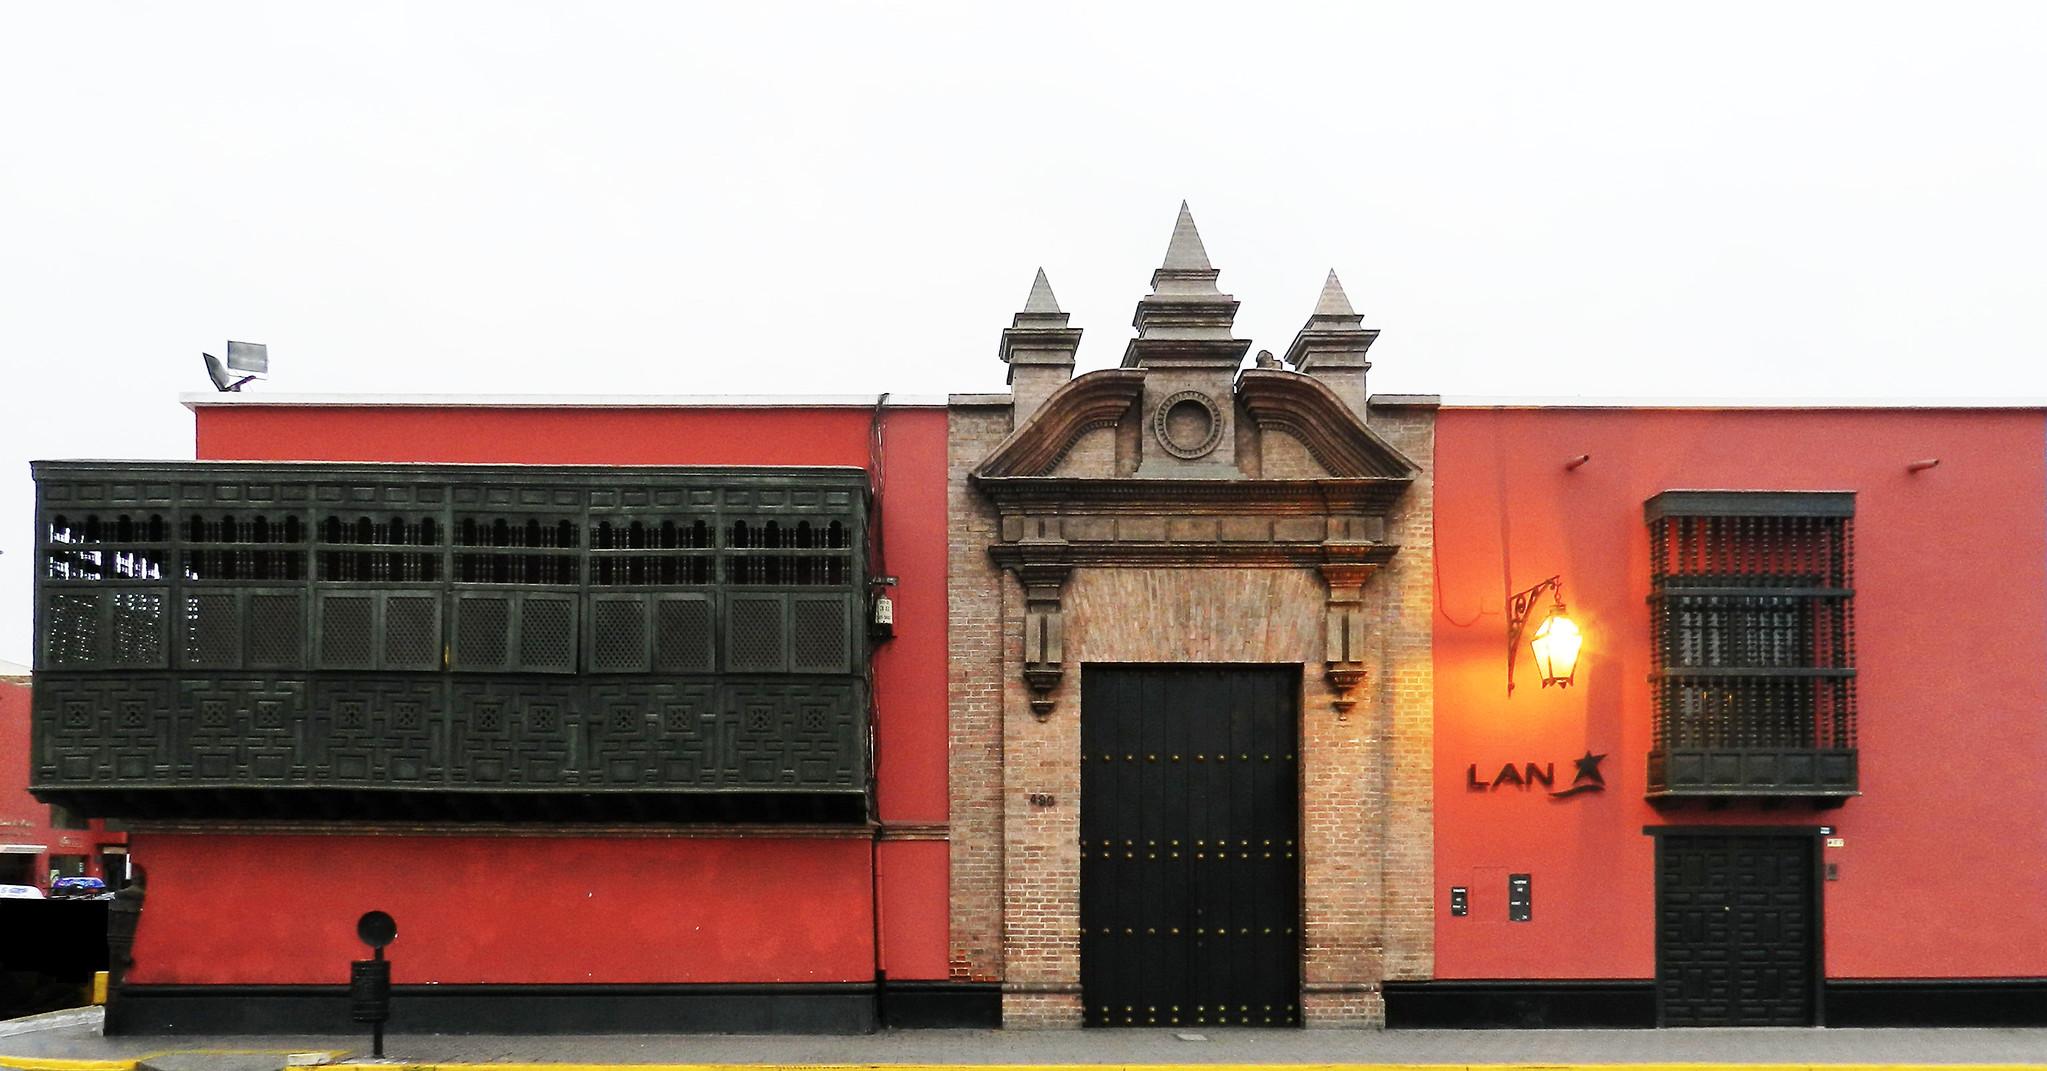 edificio en Plaza de Armas casa Jiron Almagro Trujillo en Perú